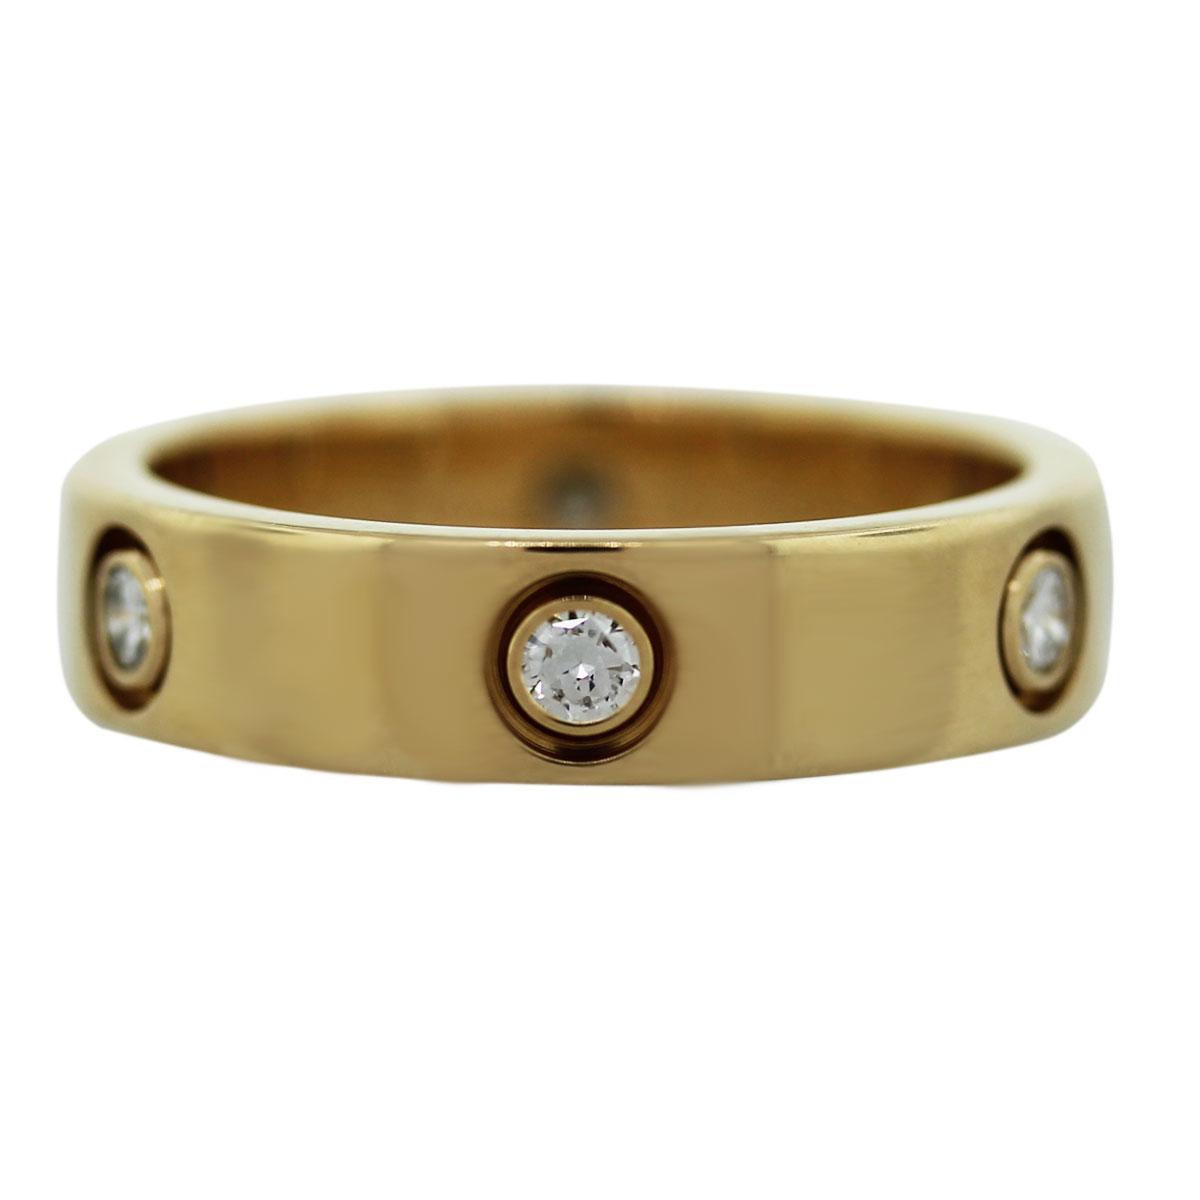 Cartier 18k Yellow Gold 6 Diamond LOVE Ring Size 63 Boca Raton